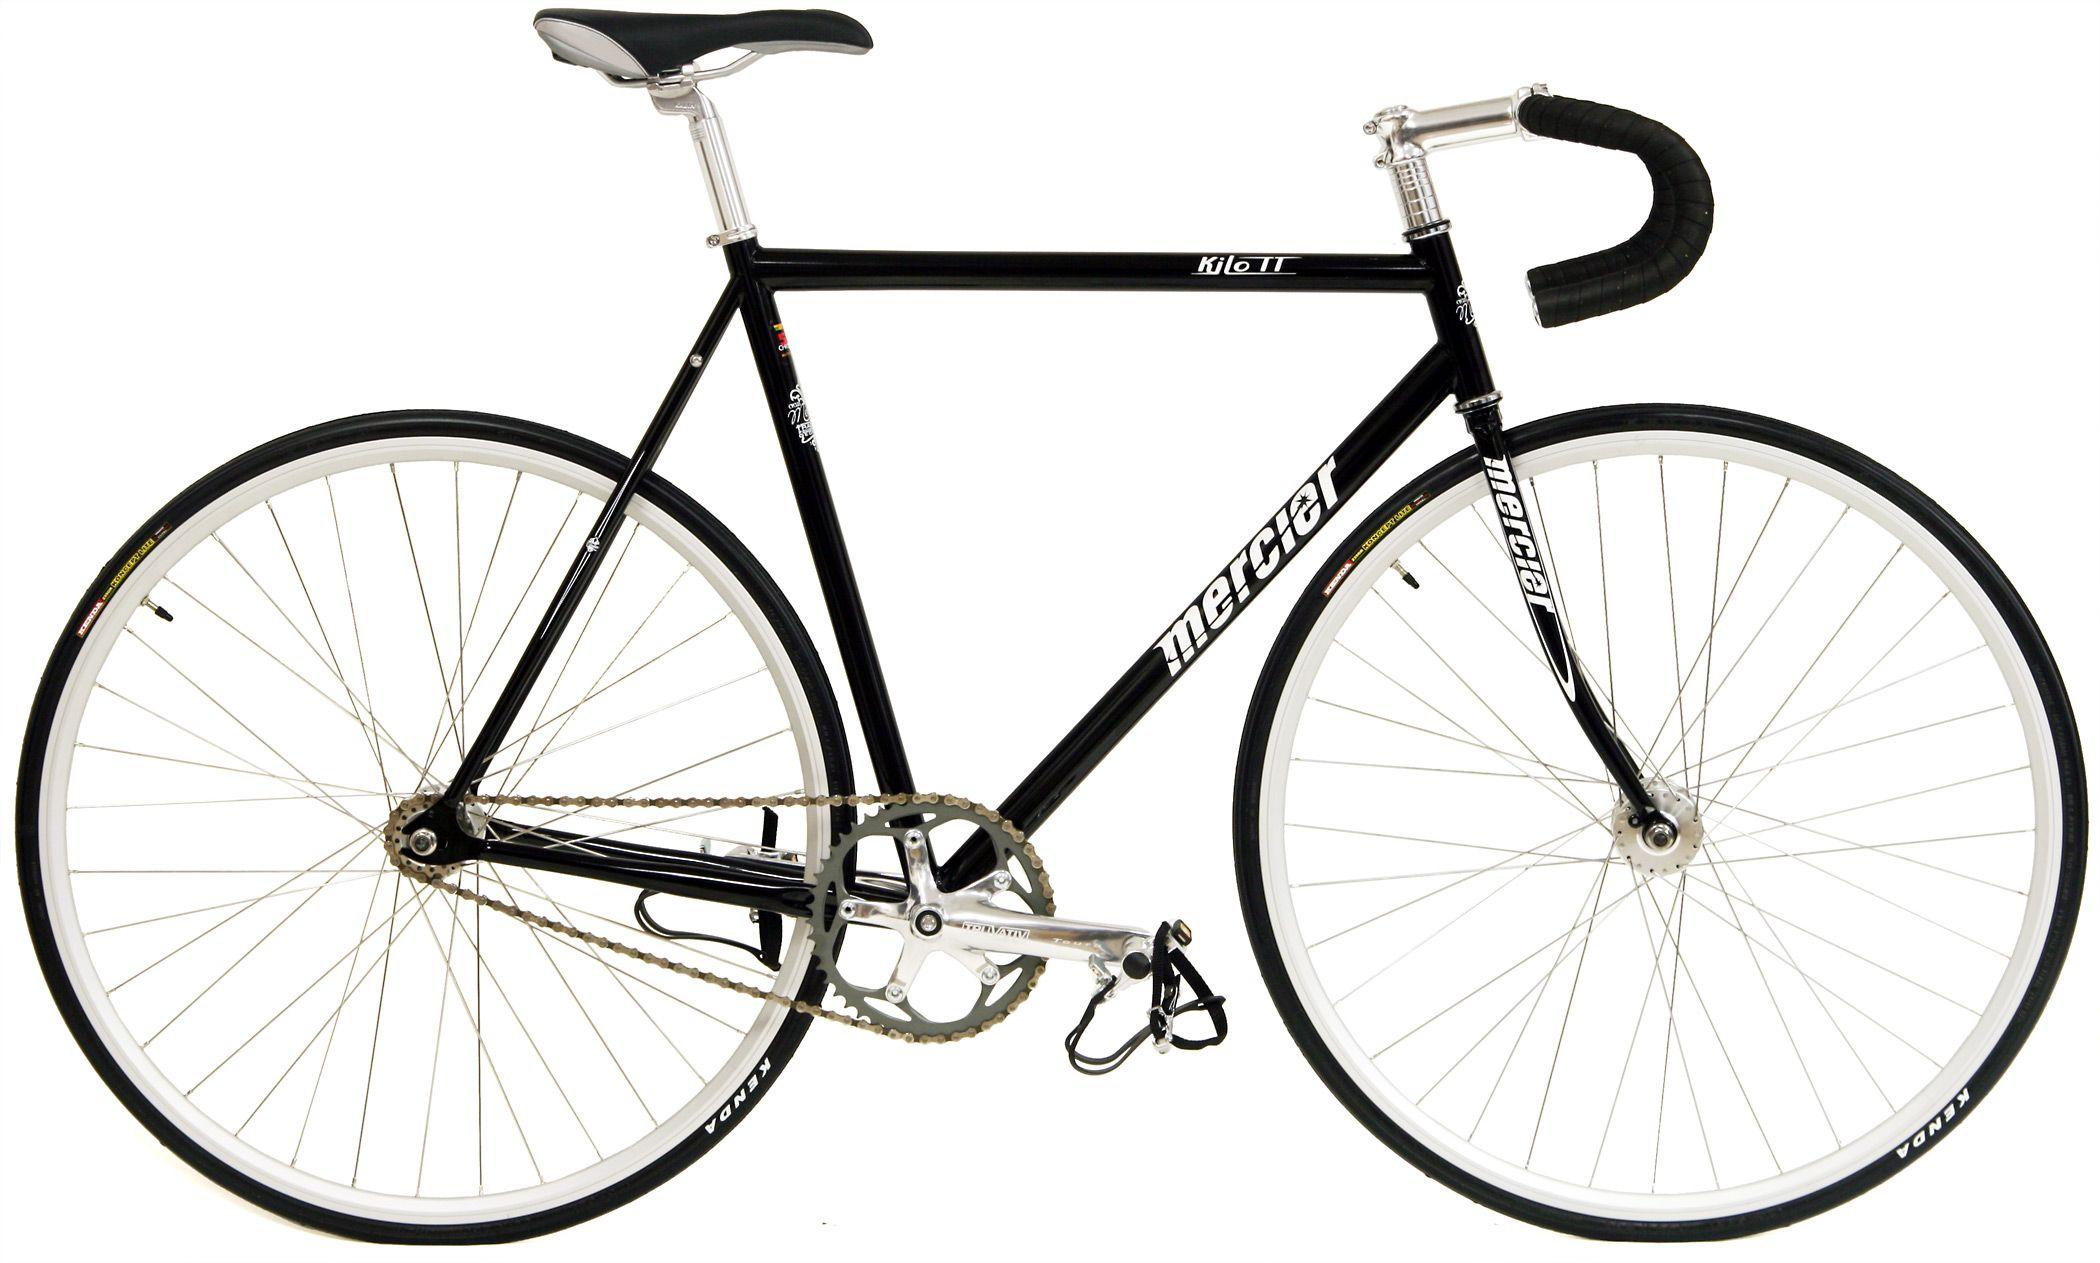 Mercier 2100 Love The Drops On This Best Bike For The Buck I Ve